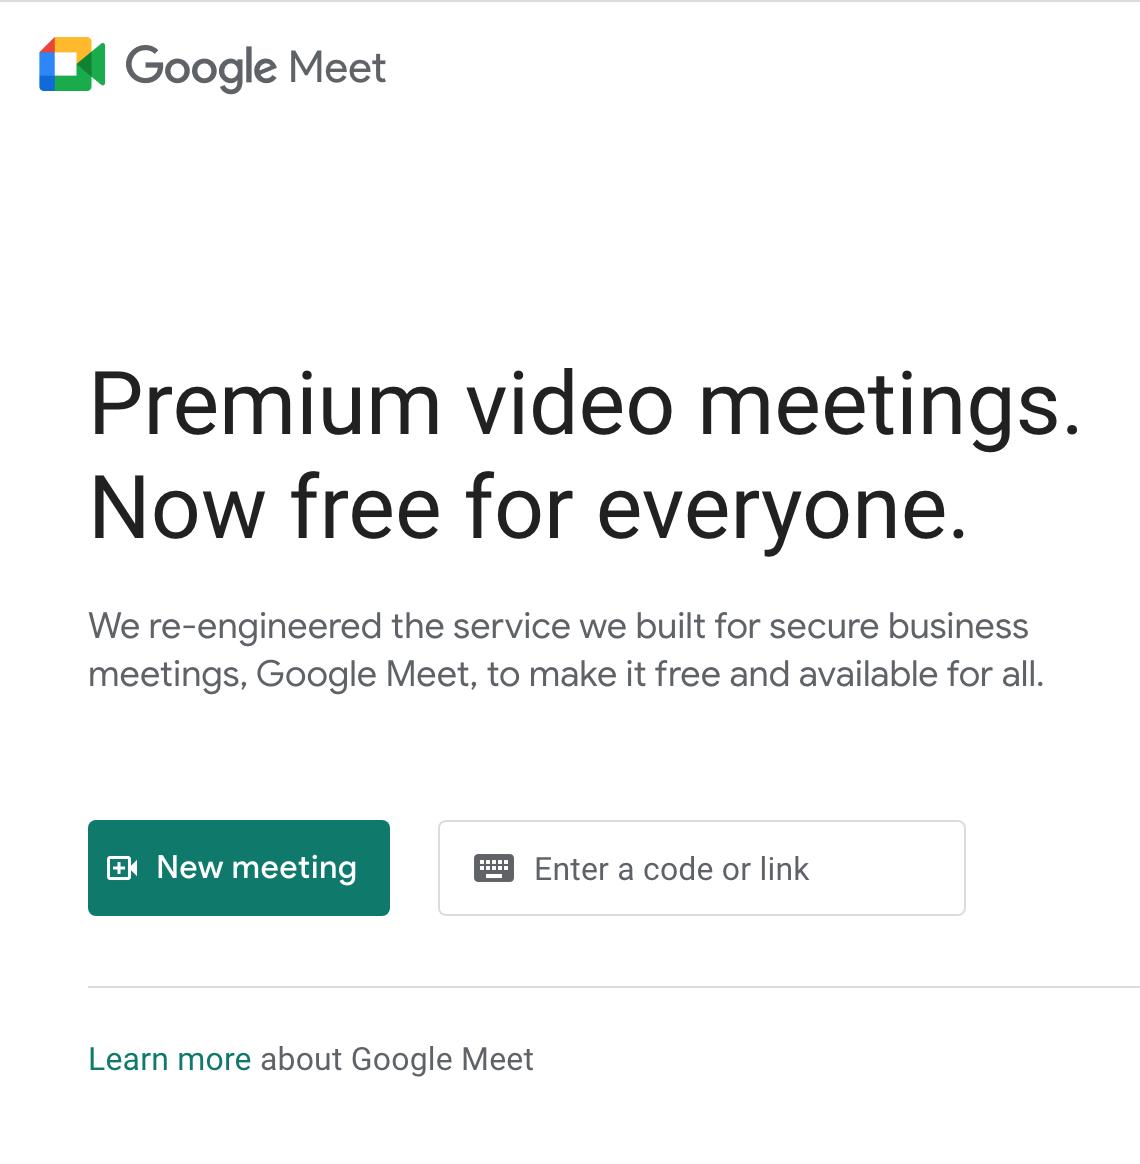 Google Meet's website